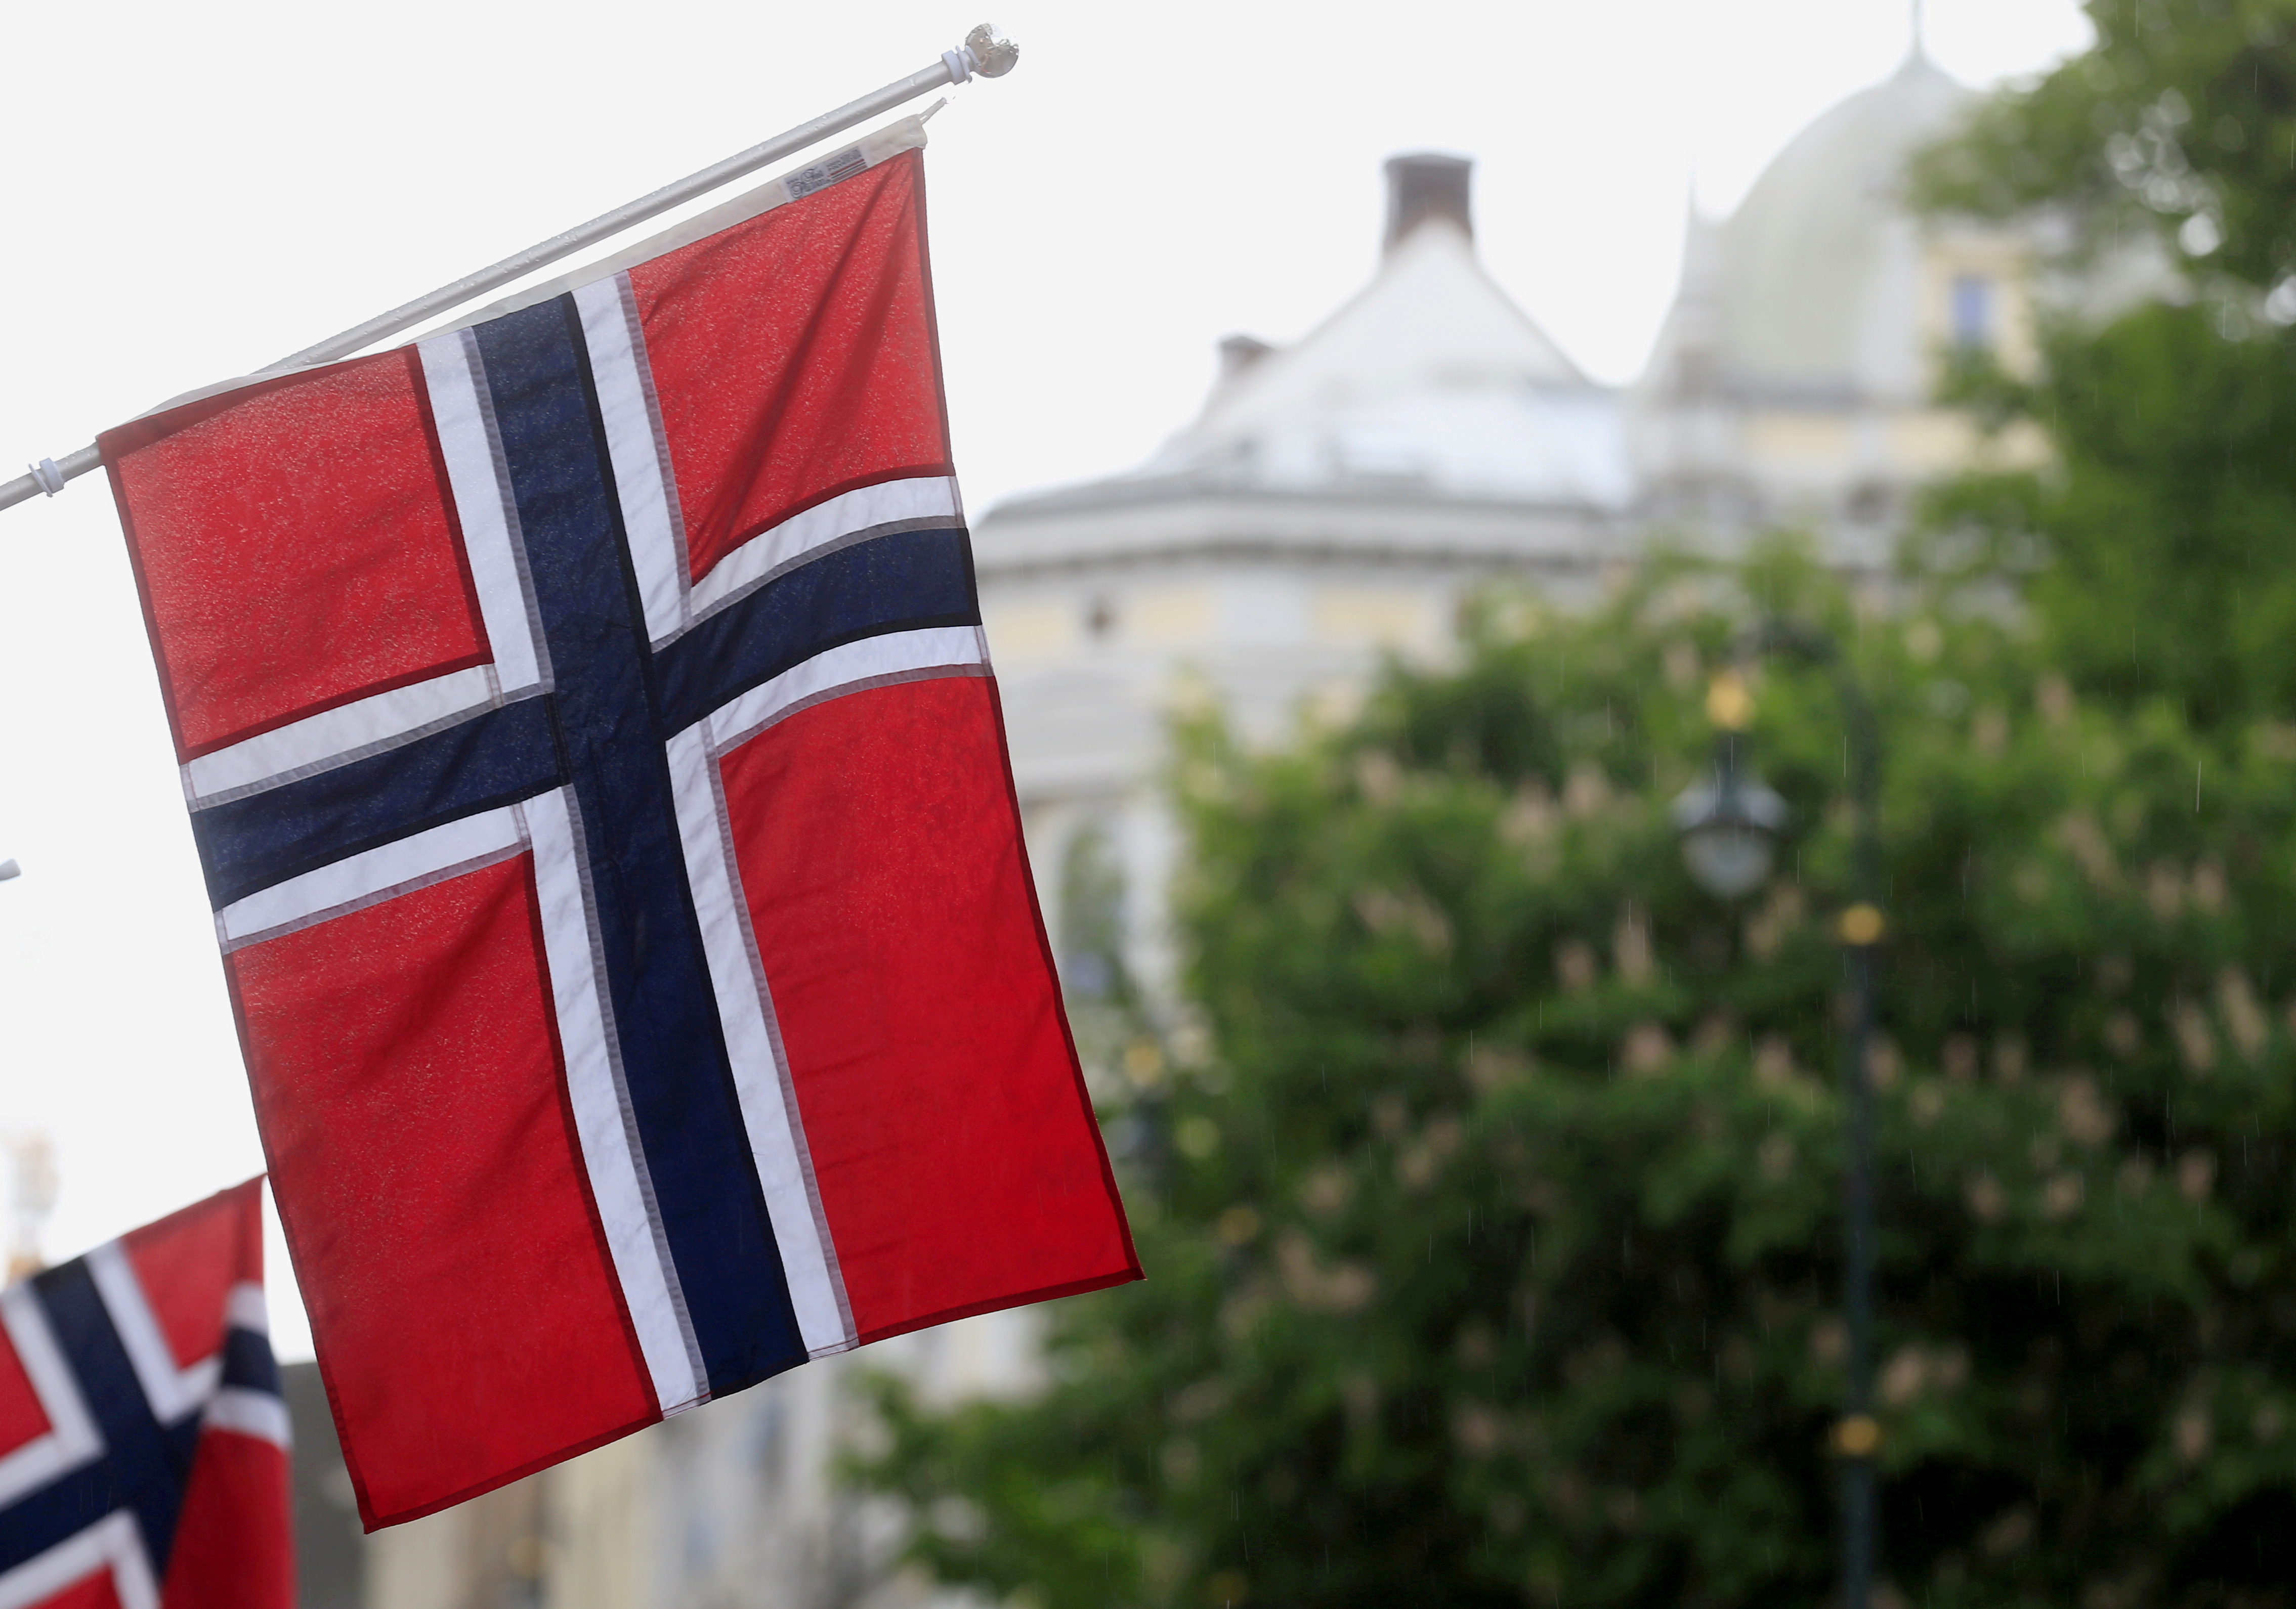 Norwegian flags flutter at Karl Johans street in Oslo, Norway, May 31, 2017. REUTERS/Ints Kalnins